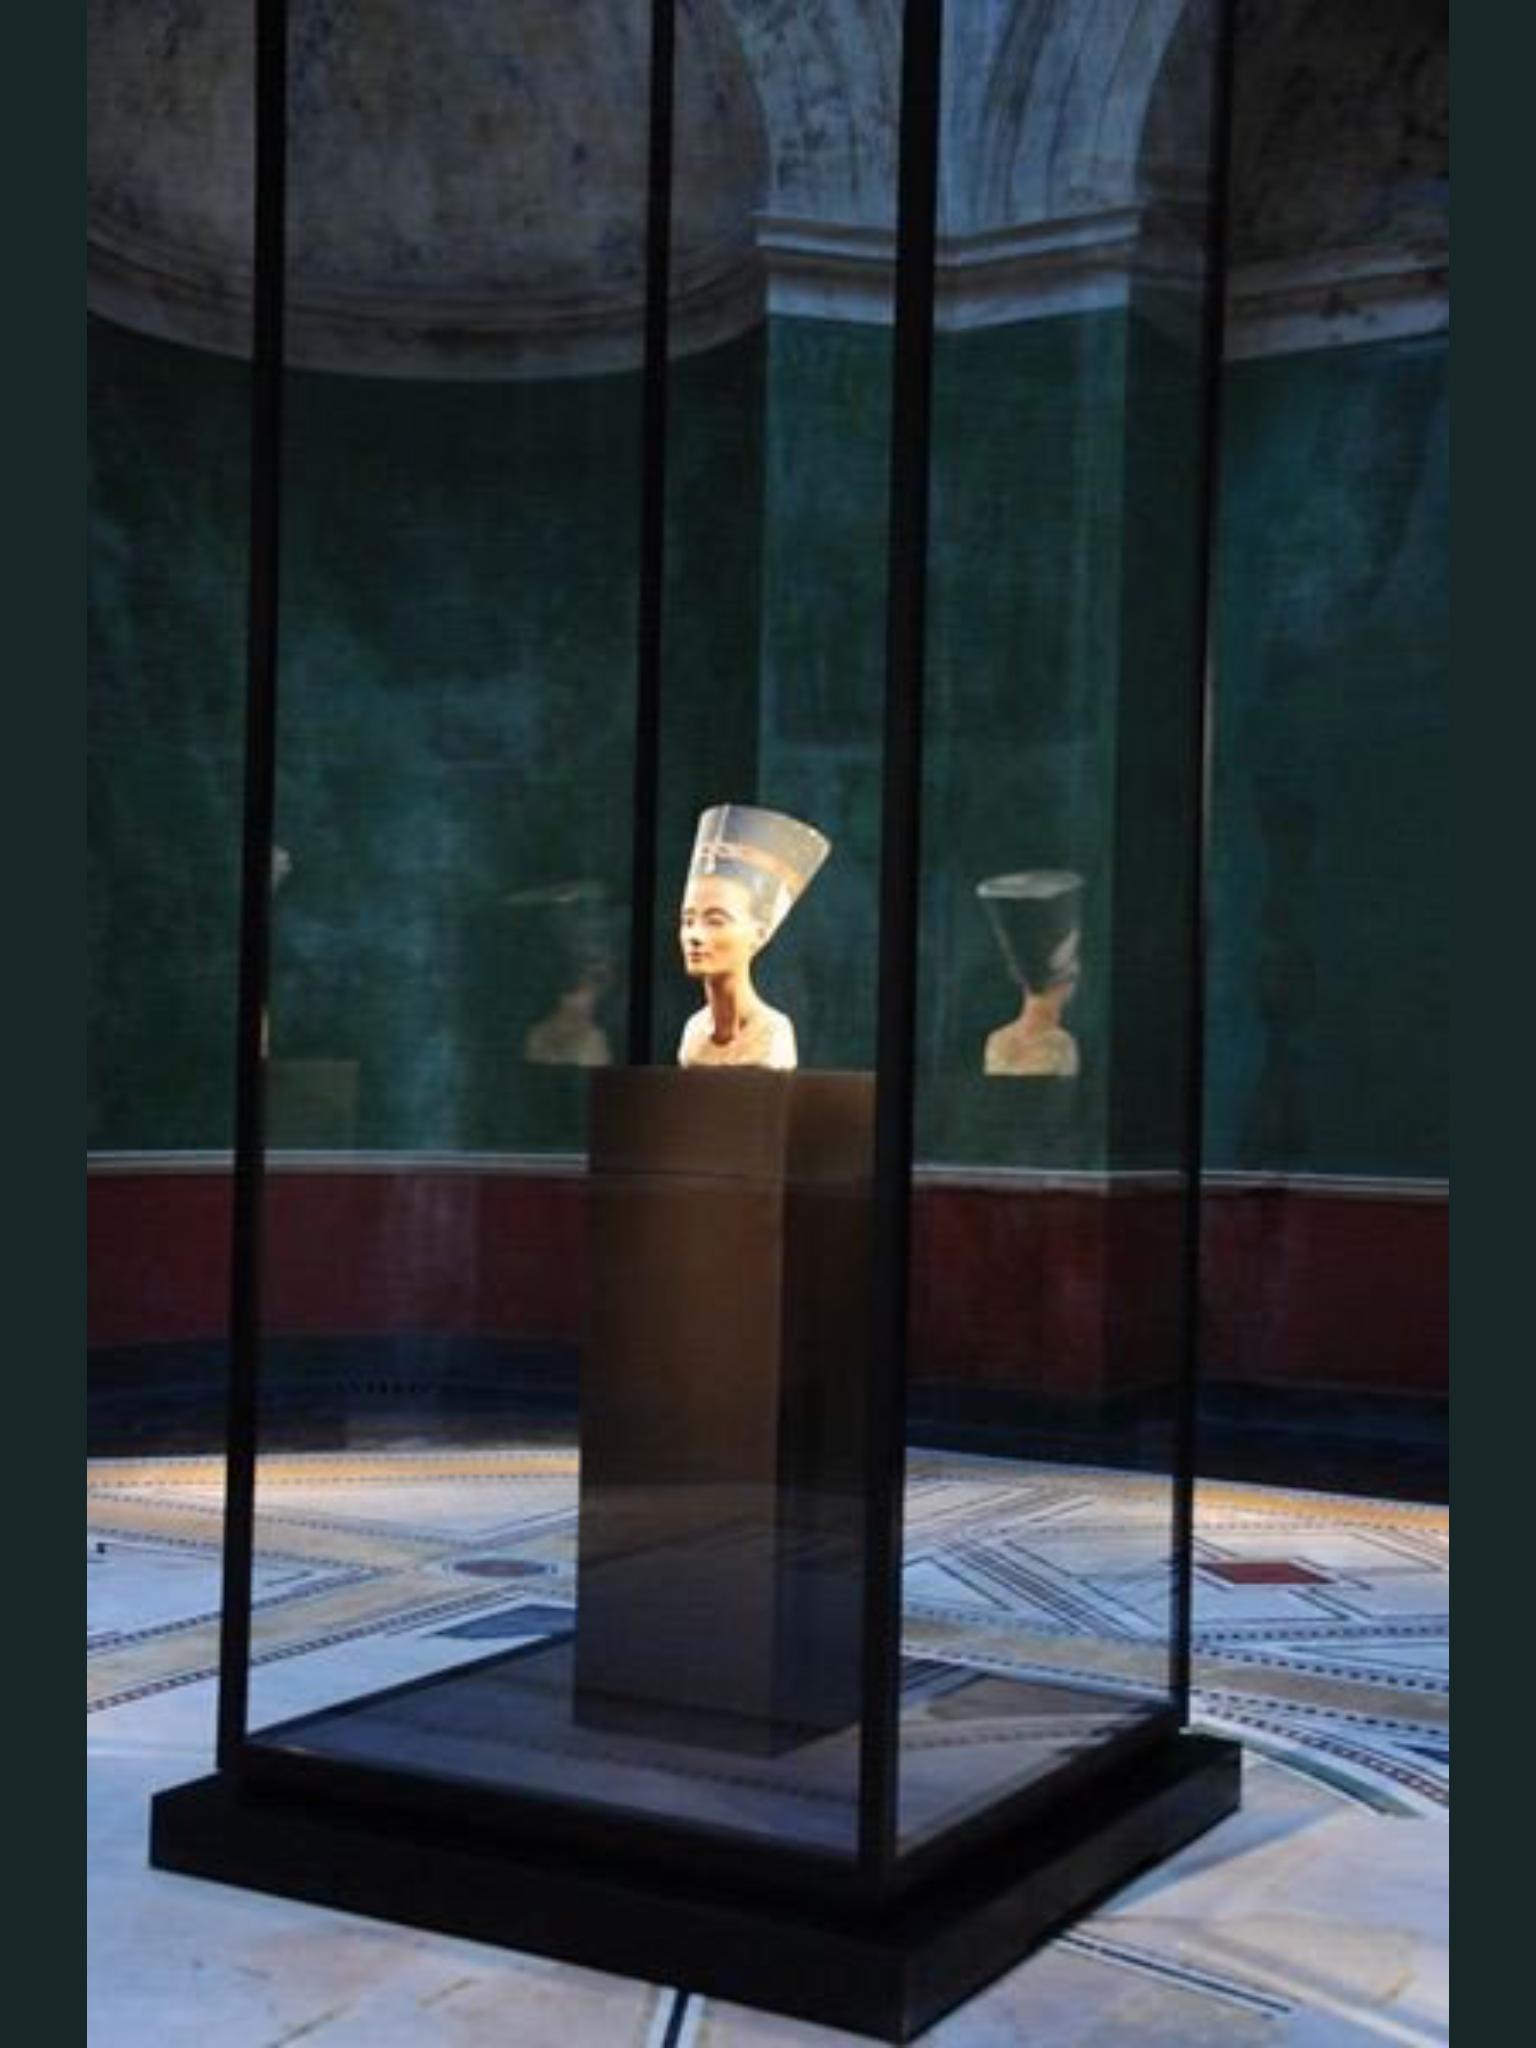 Nefertiti At Neues Museum Berlin Germany Ancient Egyptian Art Museum Displays Museum Display Cases